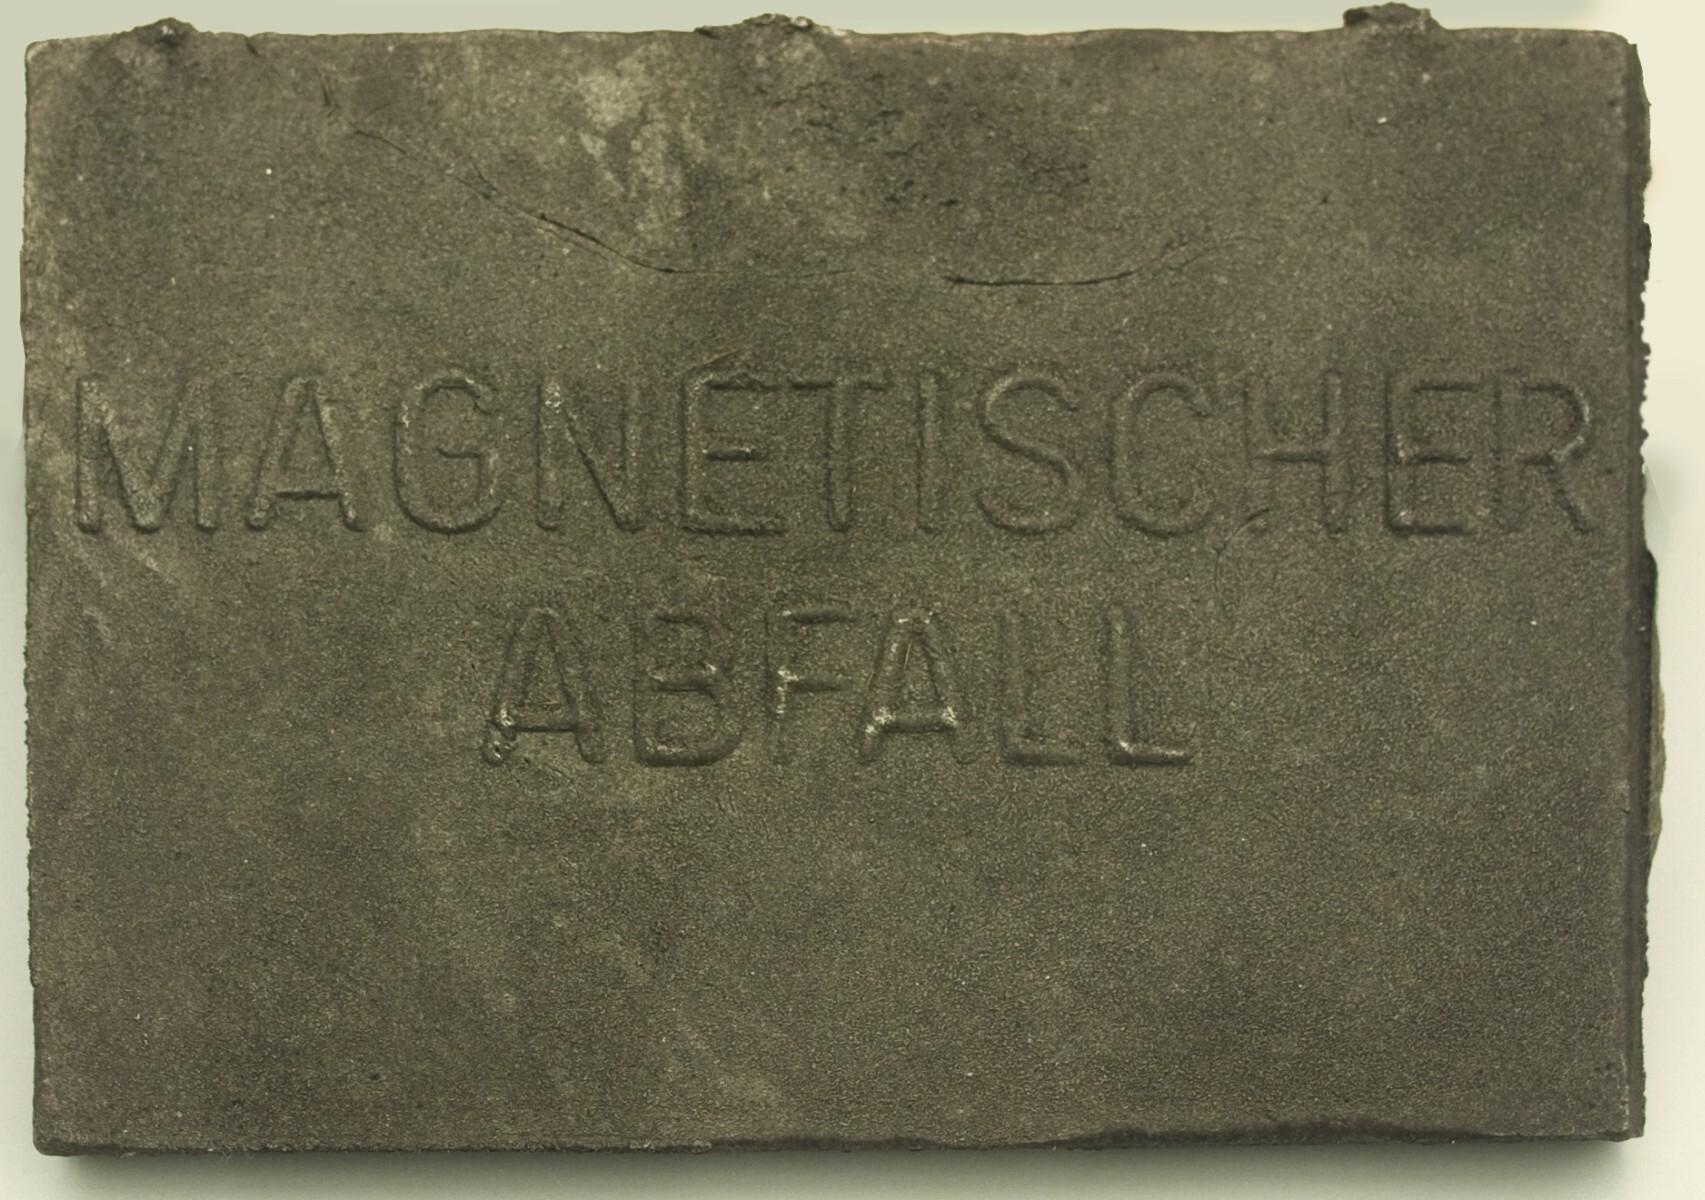 Joseph Beuys - Magnetischer Abfall